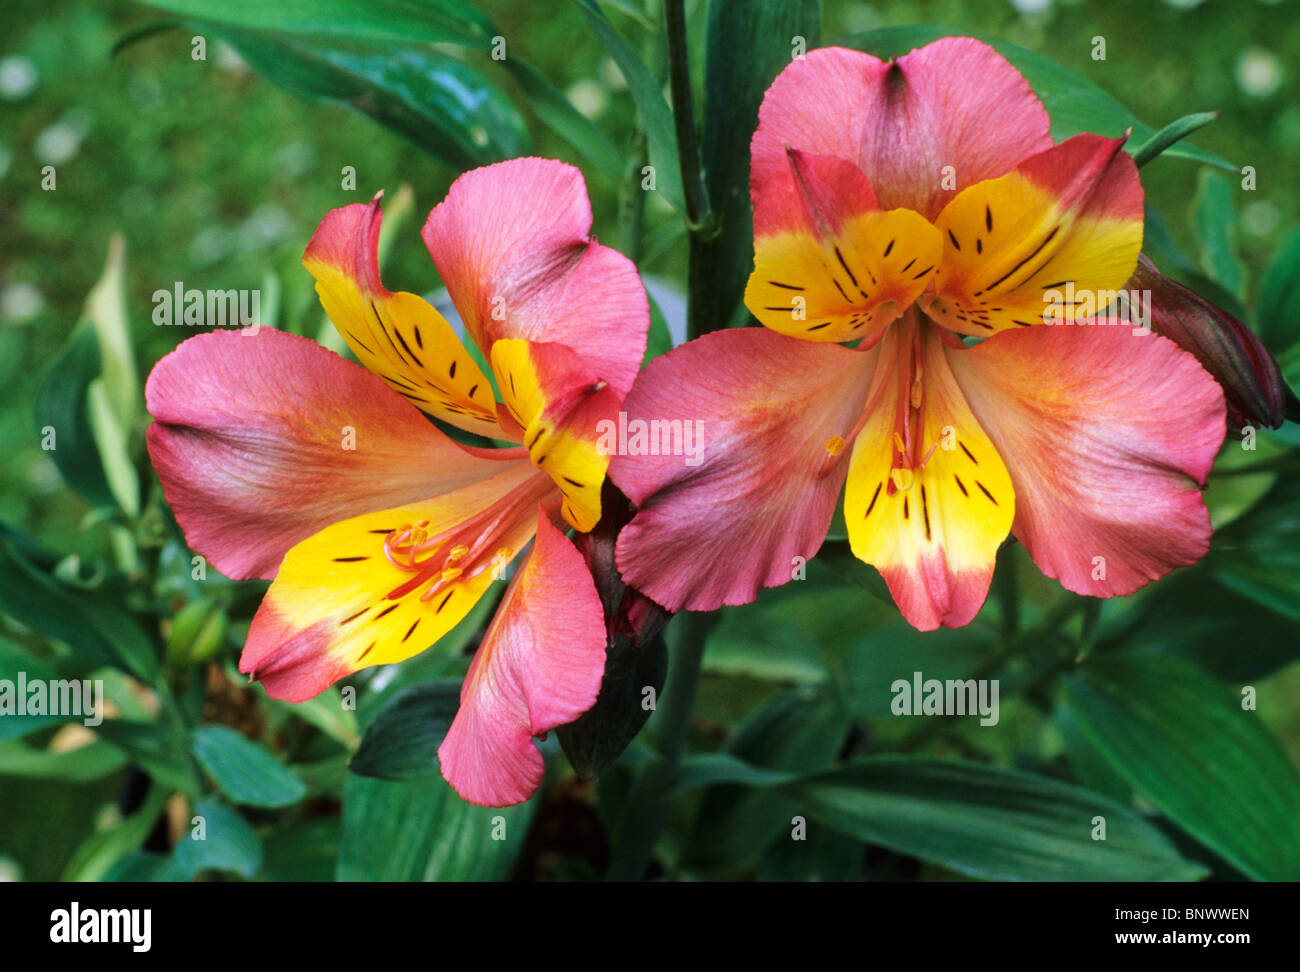 Alstroemeria Alexis Pink And Yellow Flower Flowers Garden Plant